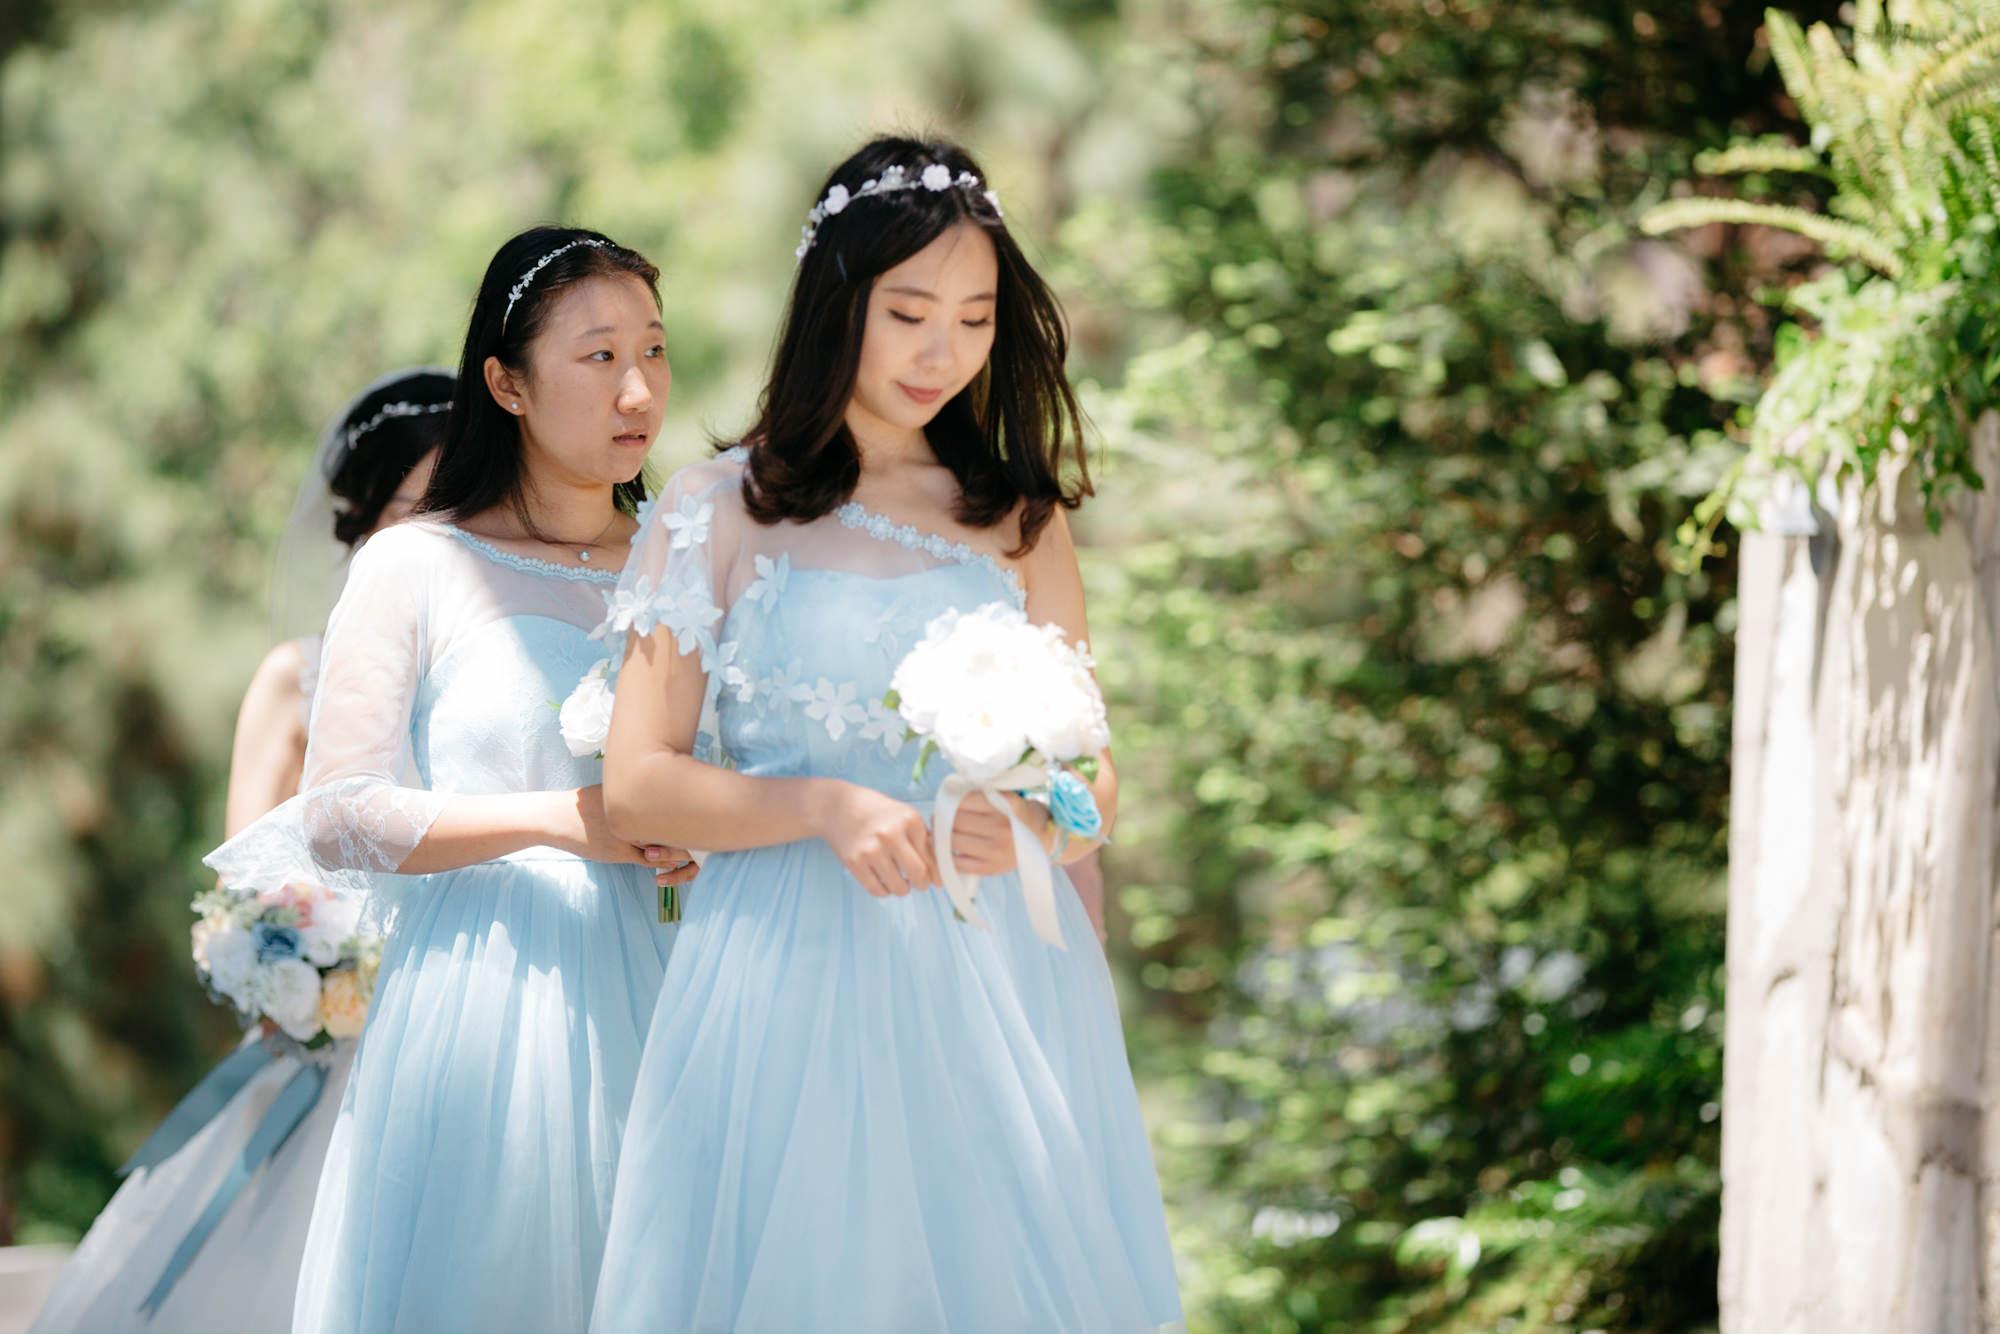 Tian and Cherry by Jenna Pangan-24.jpg